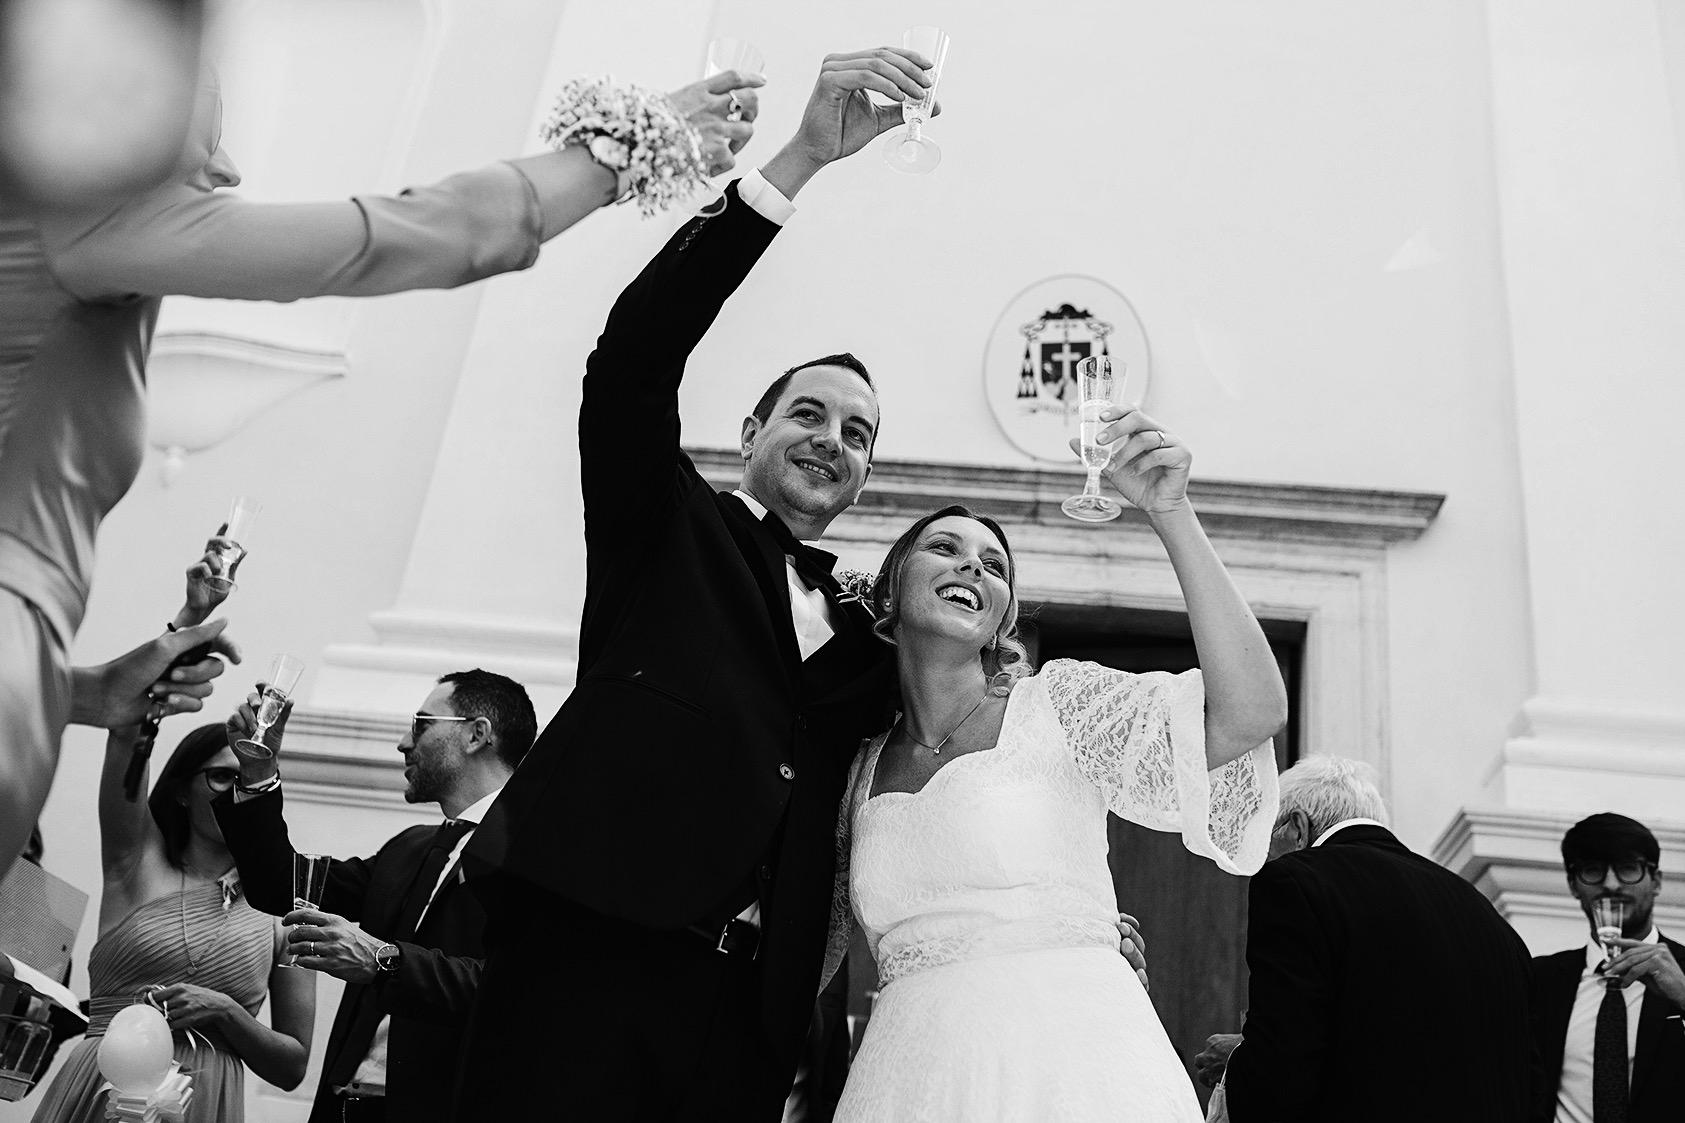 matrimonio treviso • fotografa Deborah Brugnera matrimonio veneto Conegliano • Locanda Rosa Rosae matrimonio •